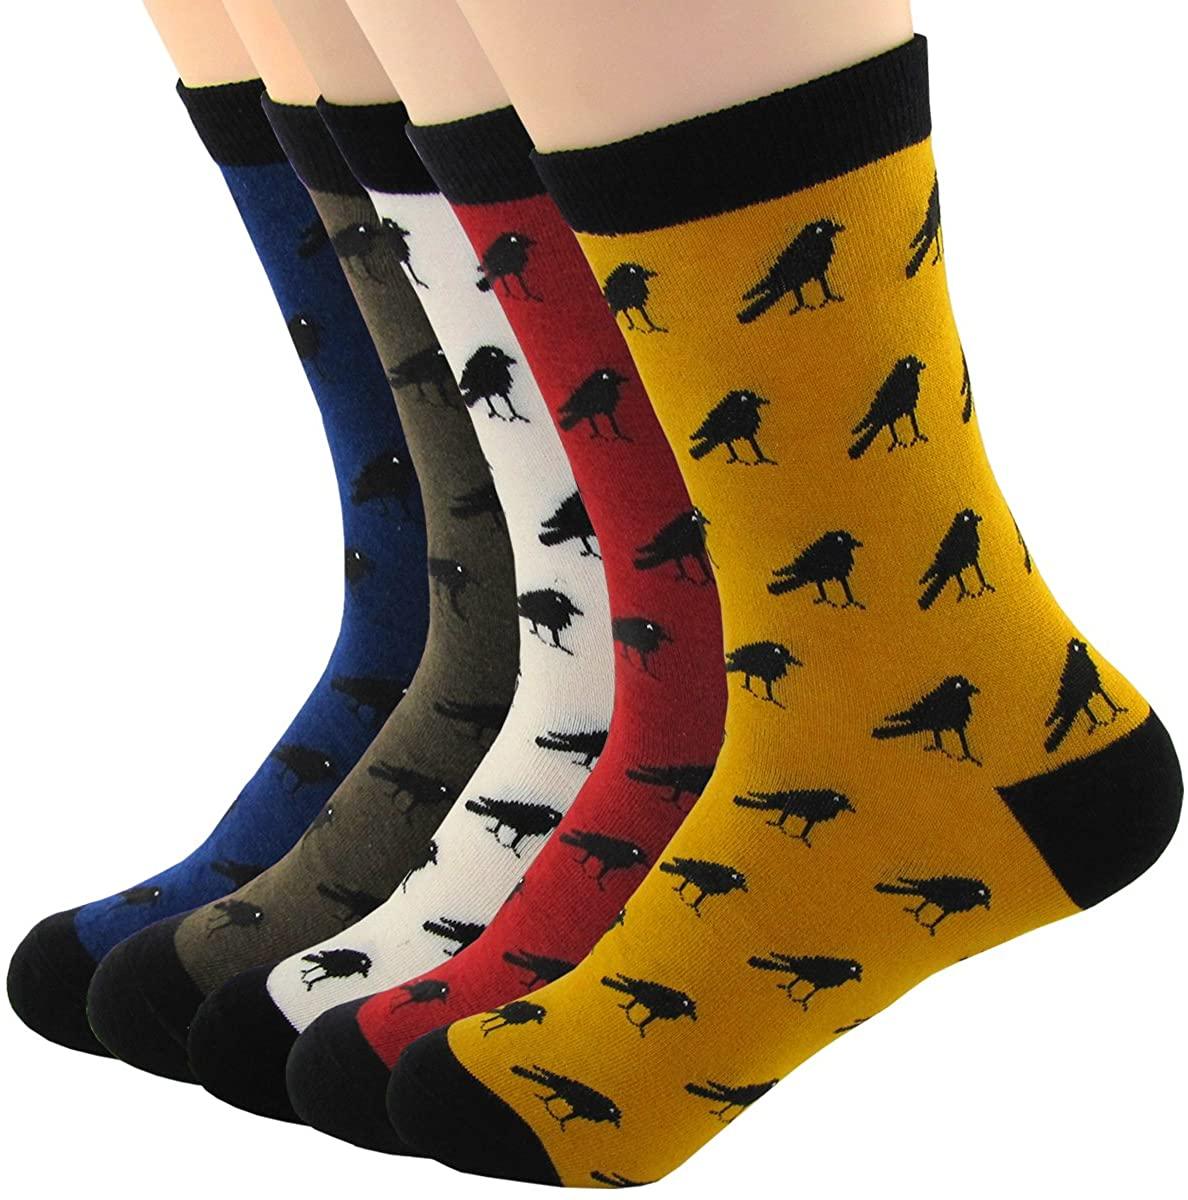 XSBQBC Men's Cute Cartoon Animal Casual Cotton Crew Socks Pack of 5